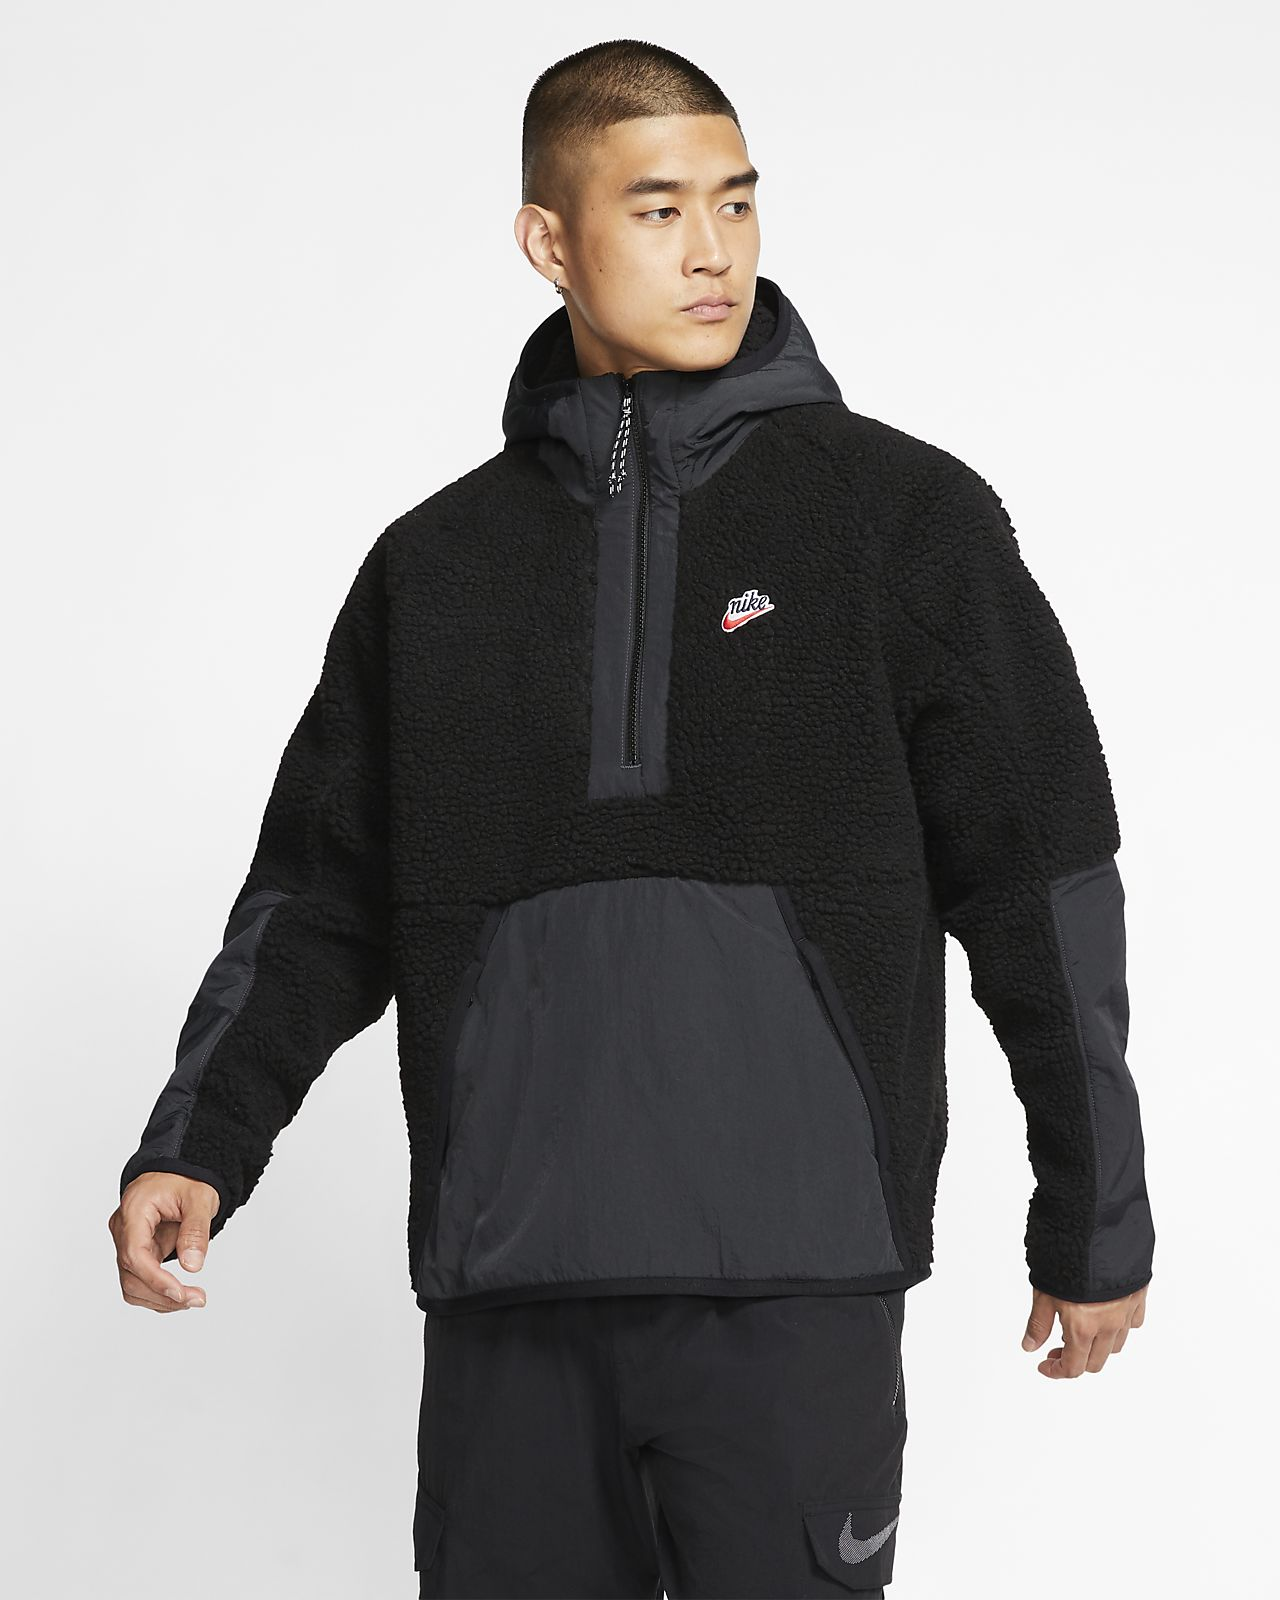 nike veste streetwear sans capuche